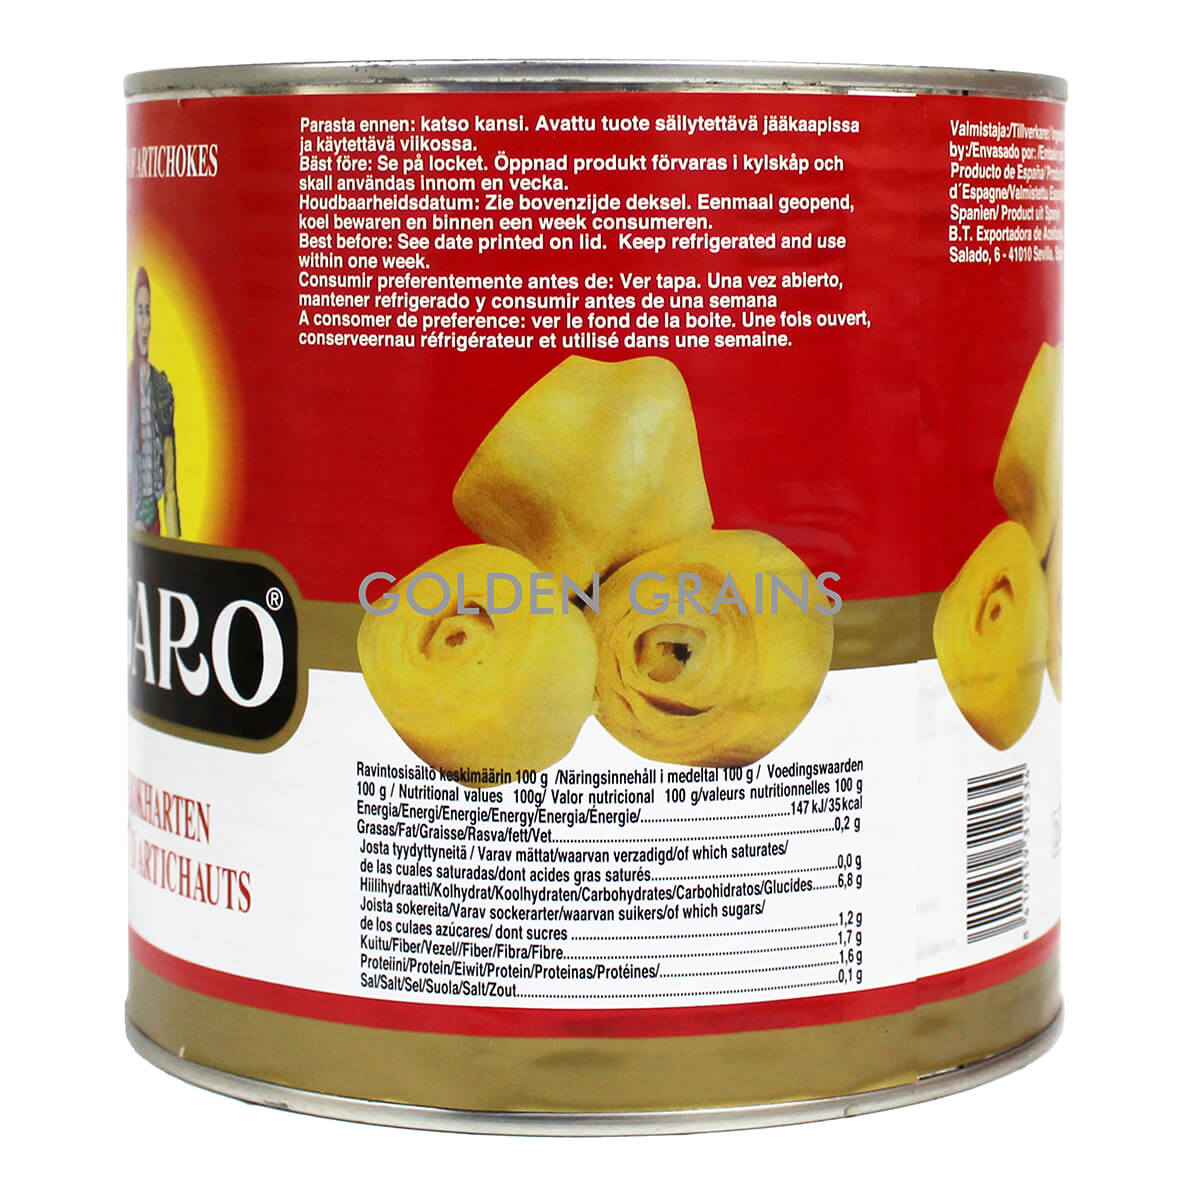 Golden Grains Dubai Export - Figaro - Artichokes - Back.jpg